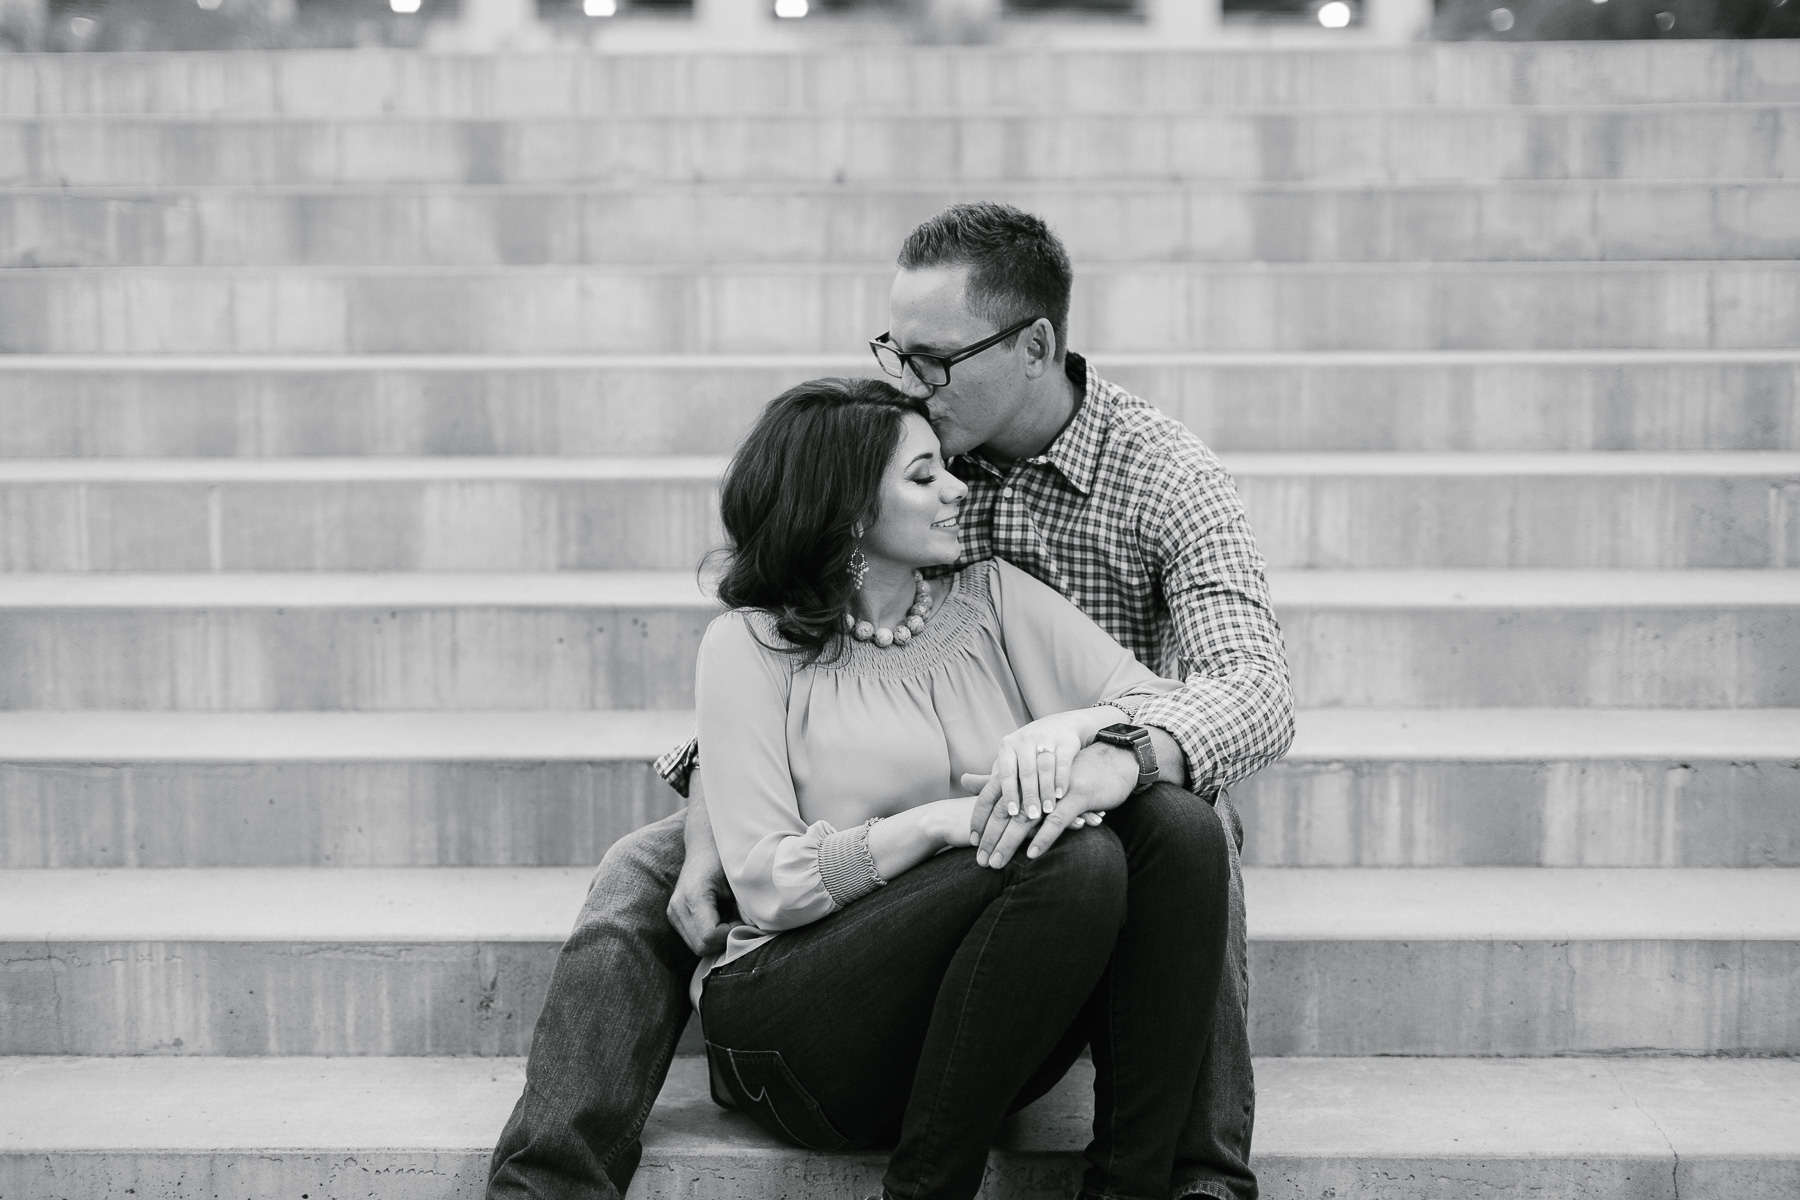 Luxium-Weddings-@matt__le-Engagement-Heritage-Square-Park-Downtown-Phoenix-Urban-Photography-112.jpg